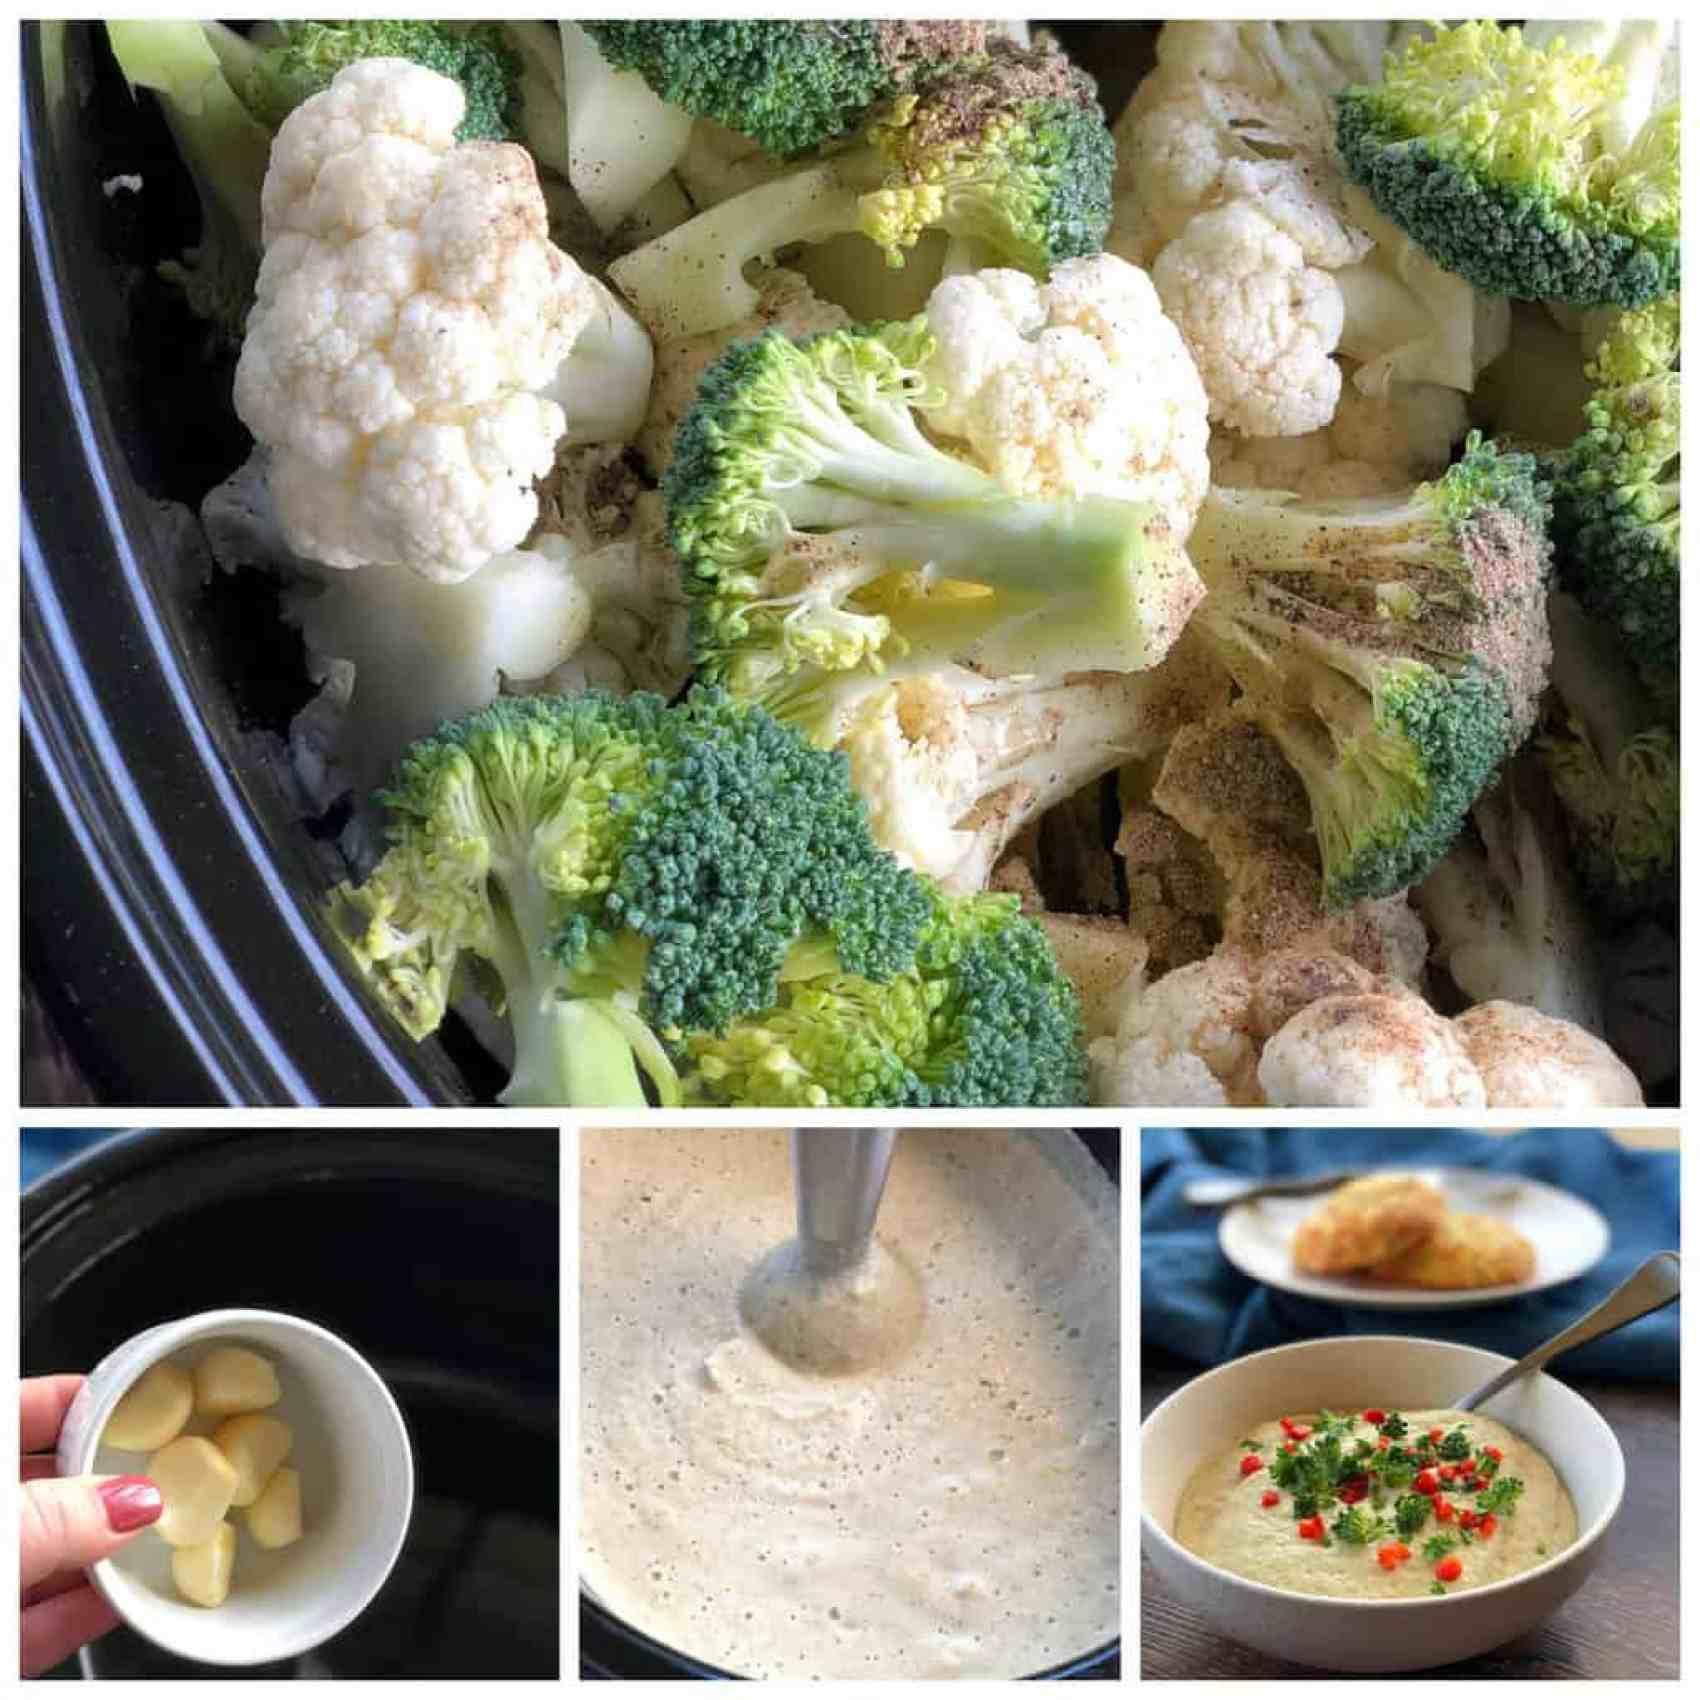 Slow Cooker Winter Cauliflower Broccoli Soup